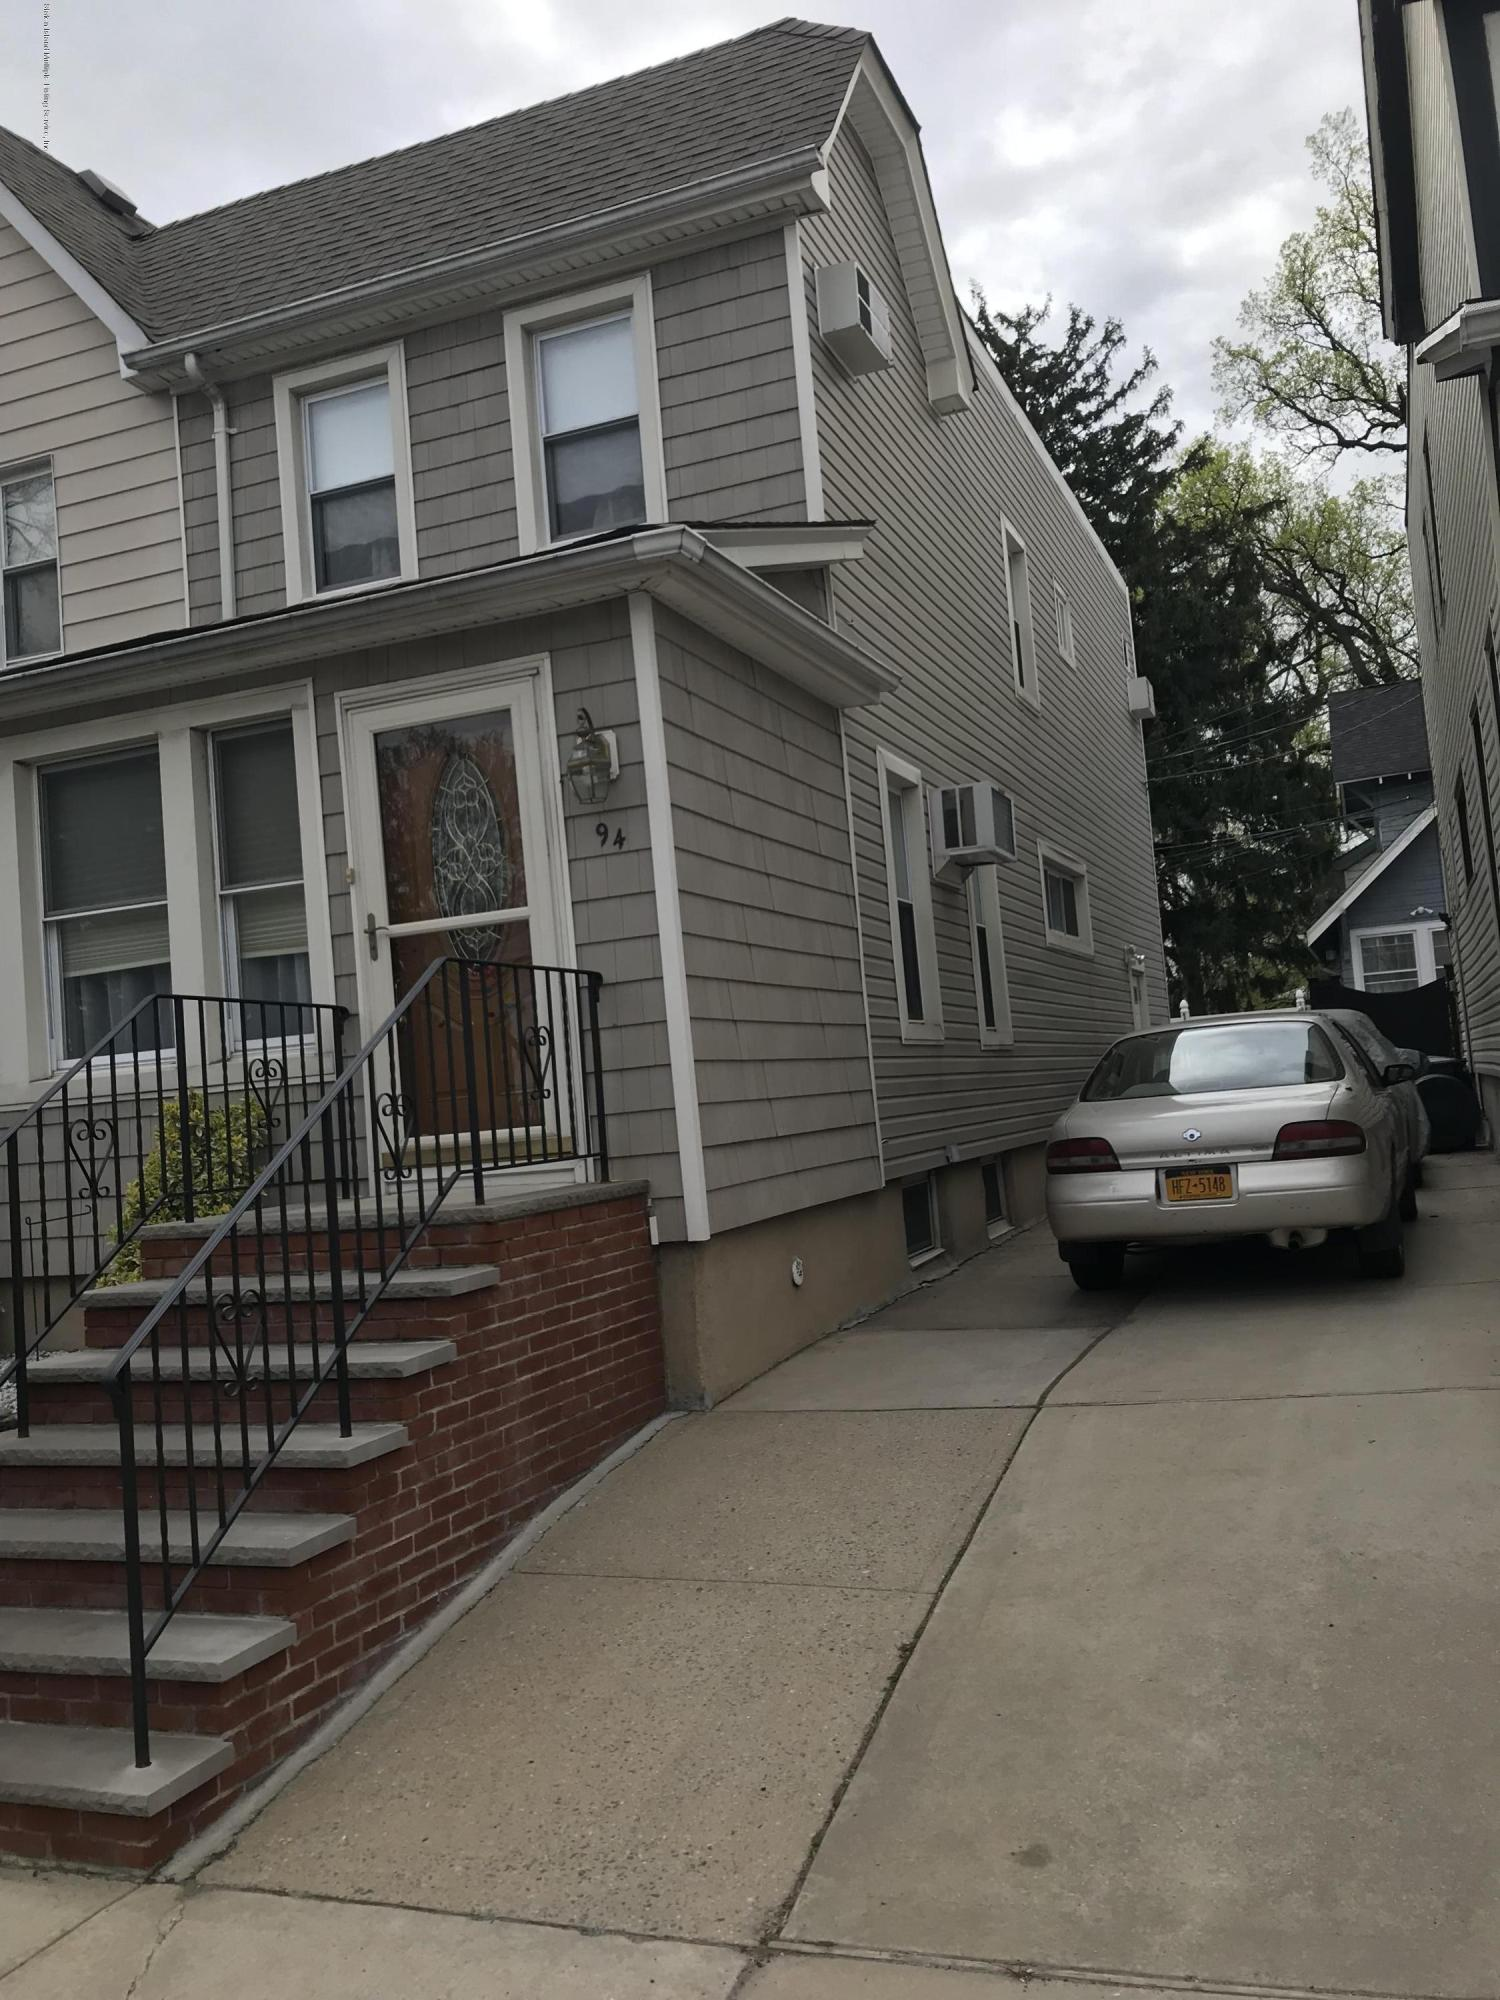 Single Family - Semi-Attached 94 Delafield Place  Staten Island, NY 10310, MLS-1128215-13